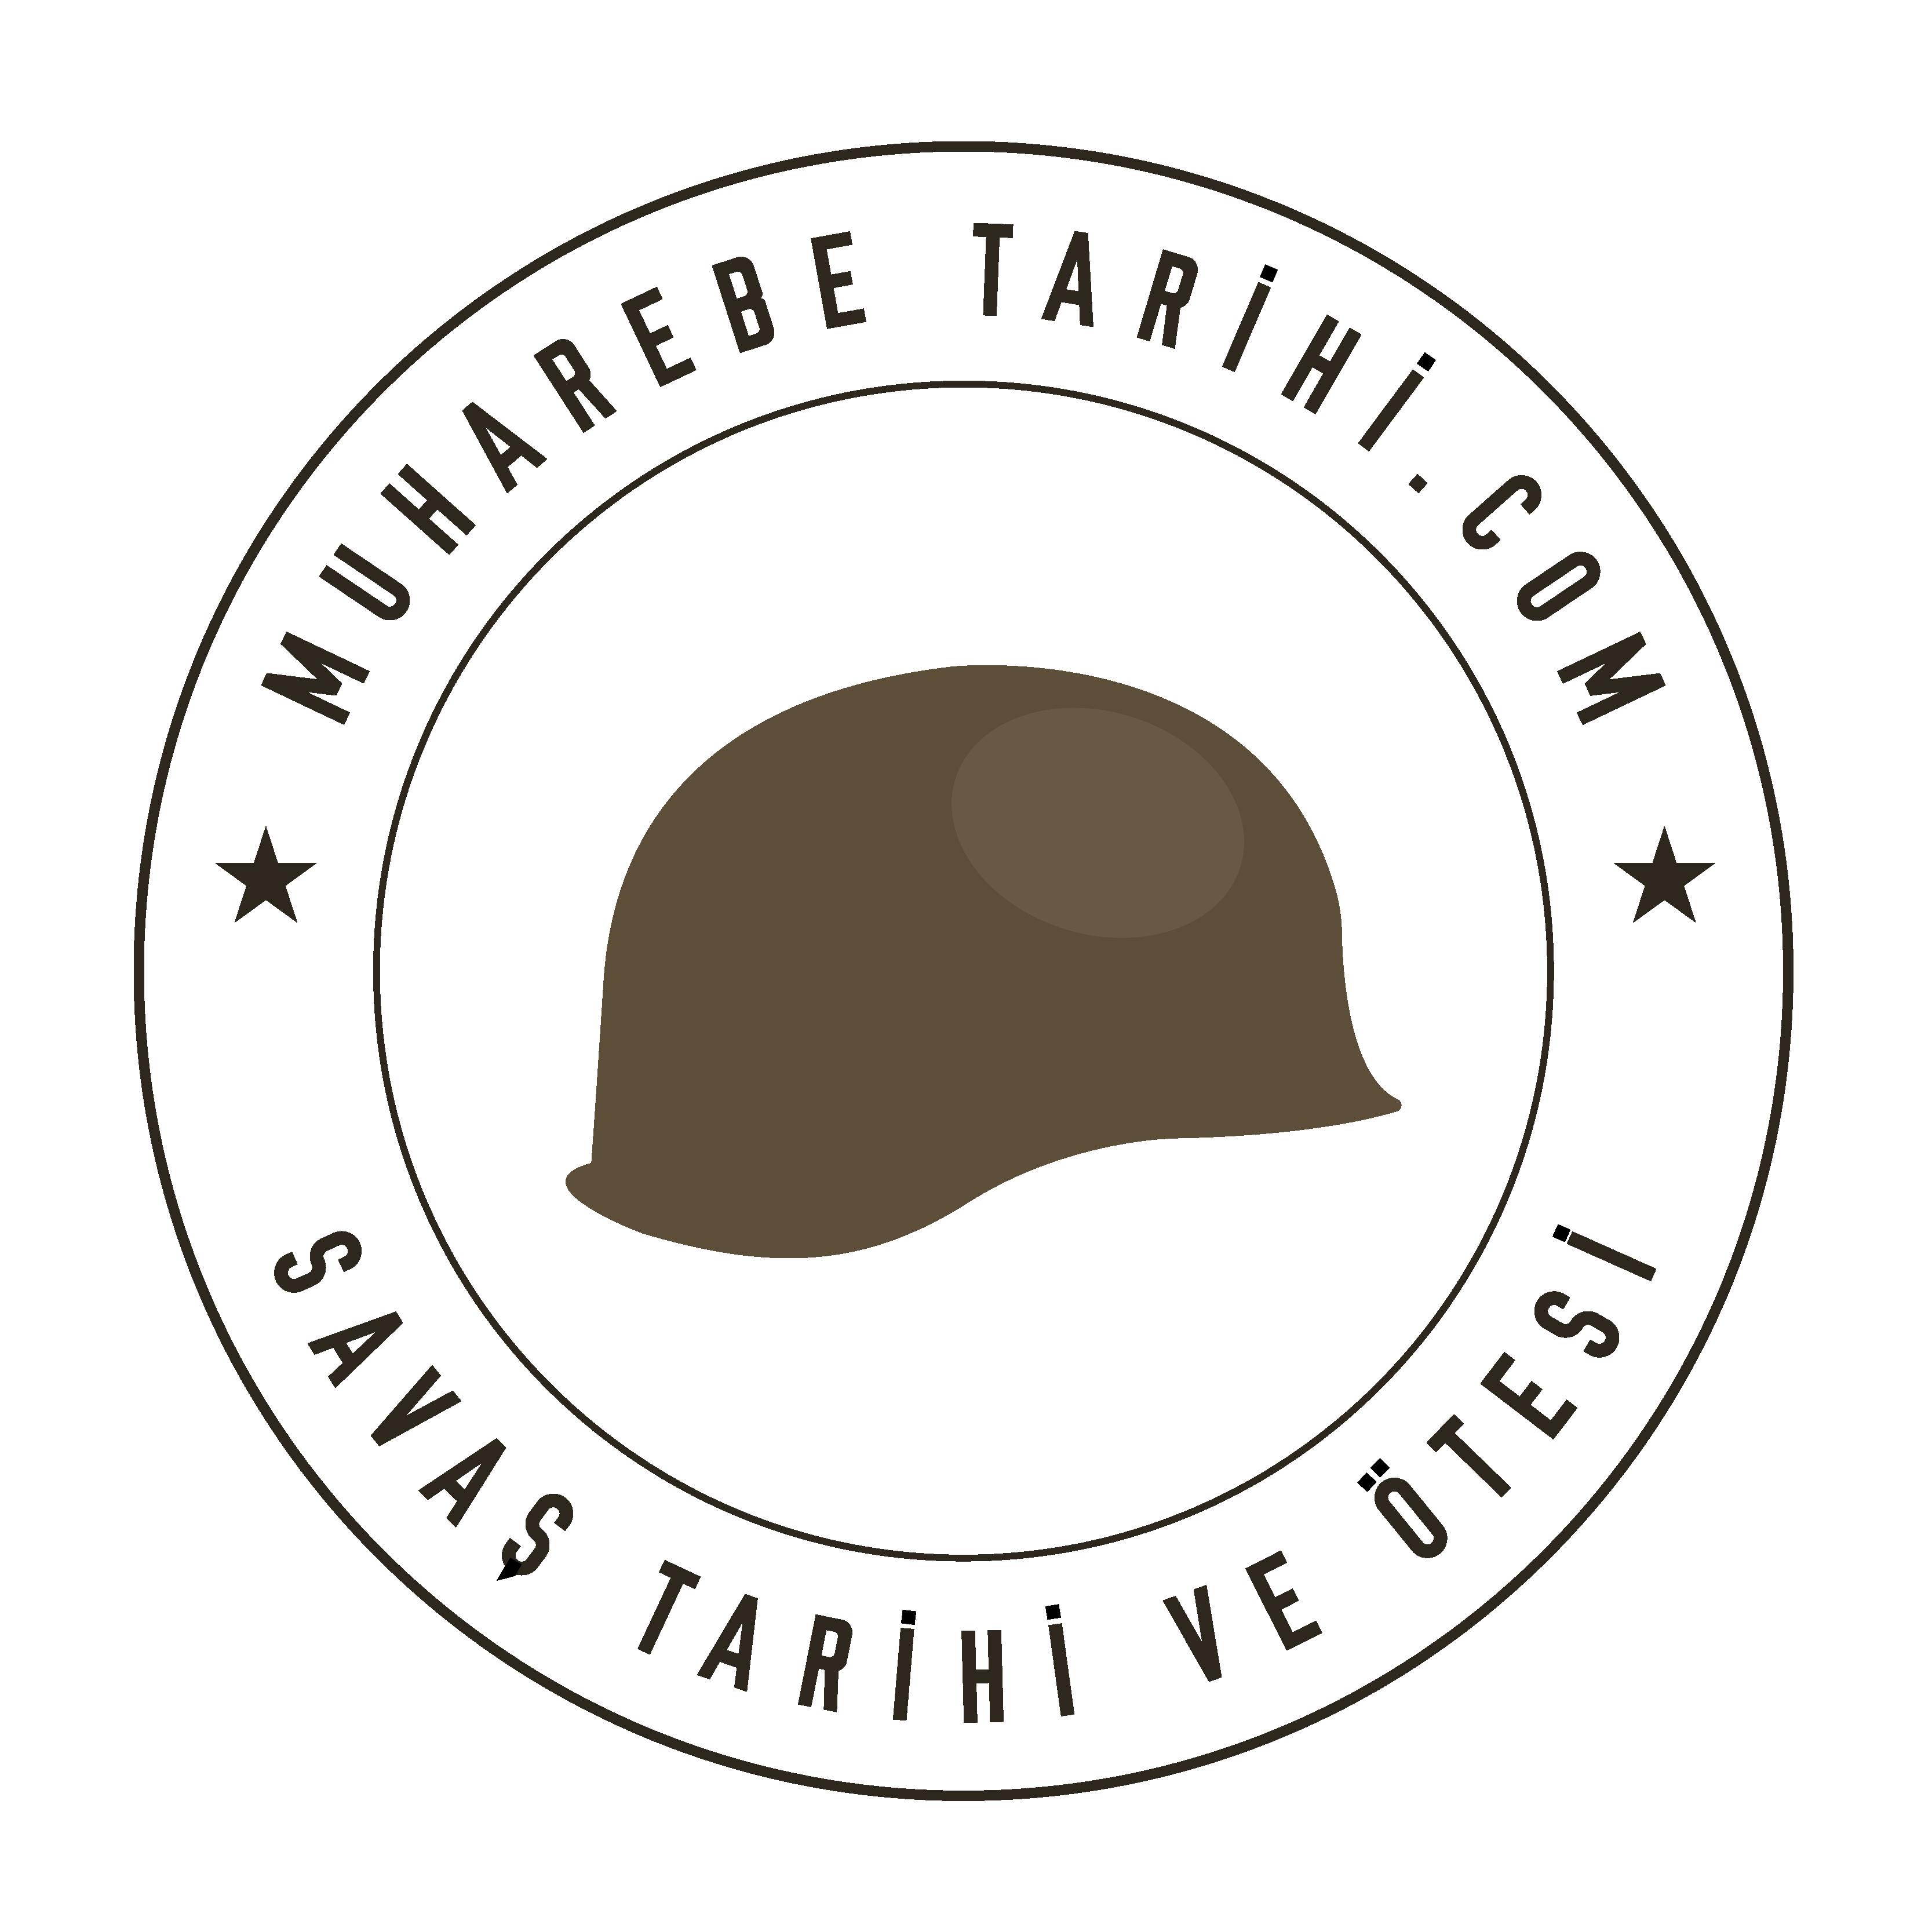 Muharebetarihi.com